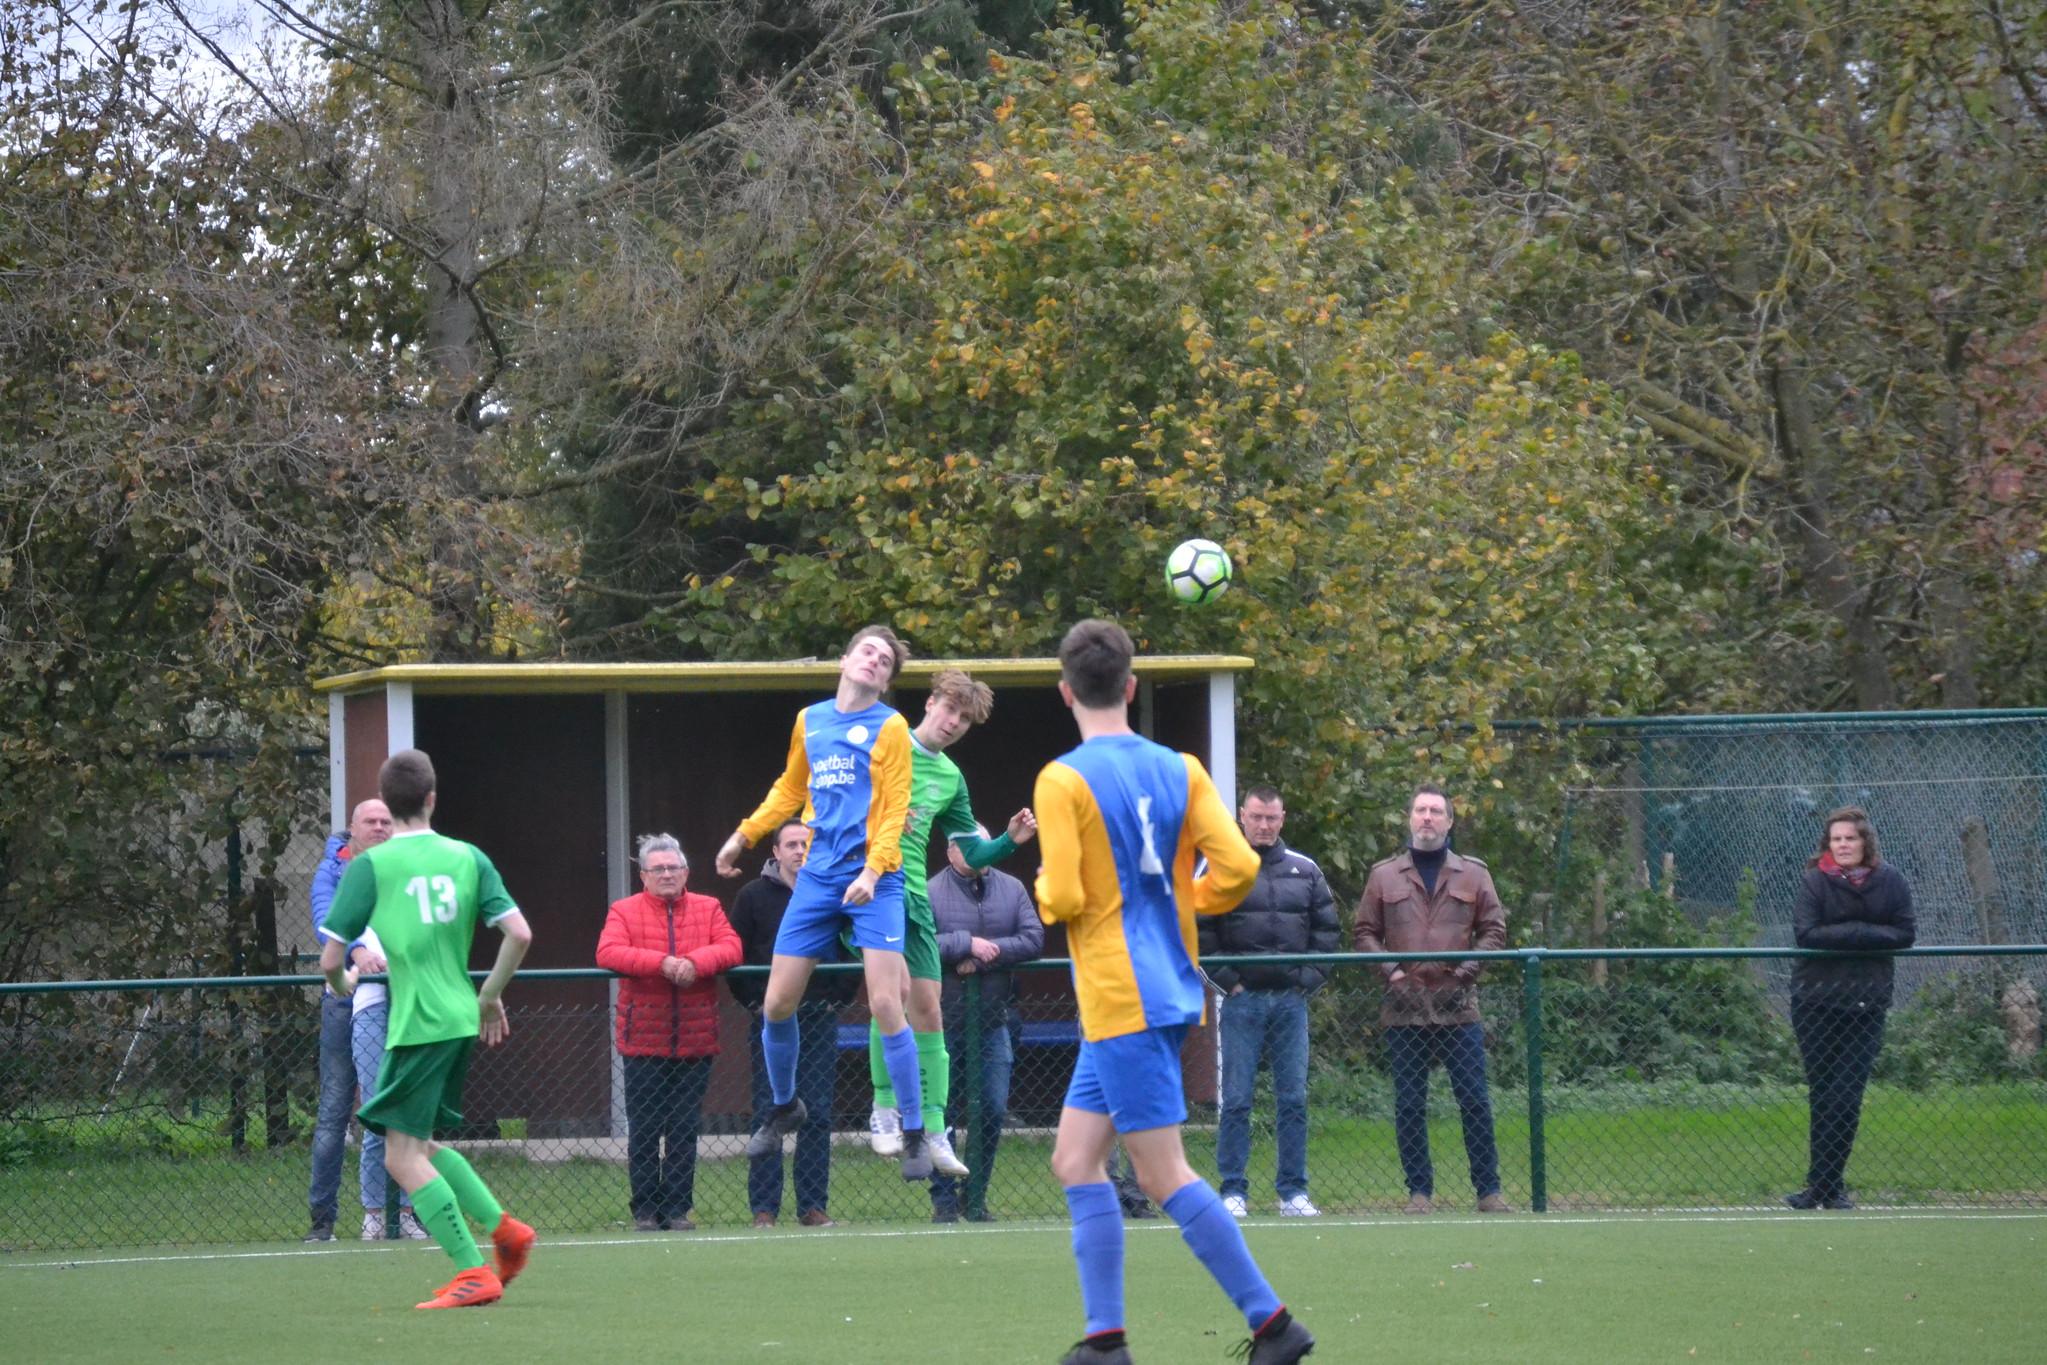 U17A - 2/11/2019 - Sporting Kampenhout - K.V.K. Ninove